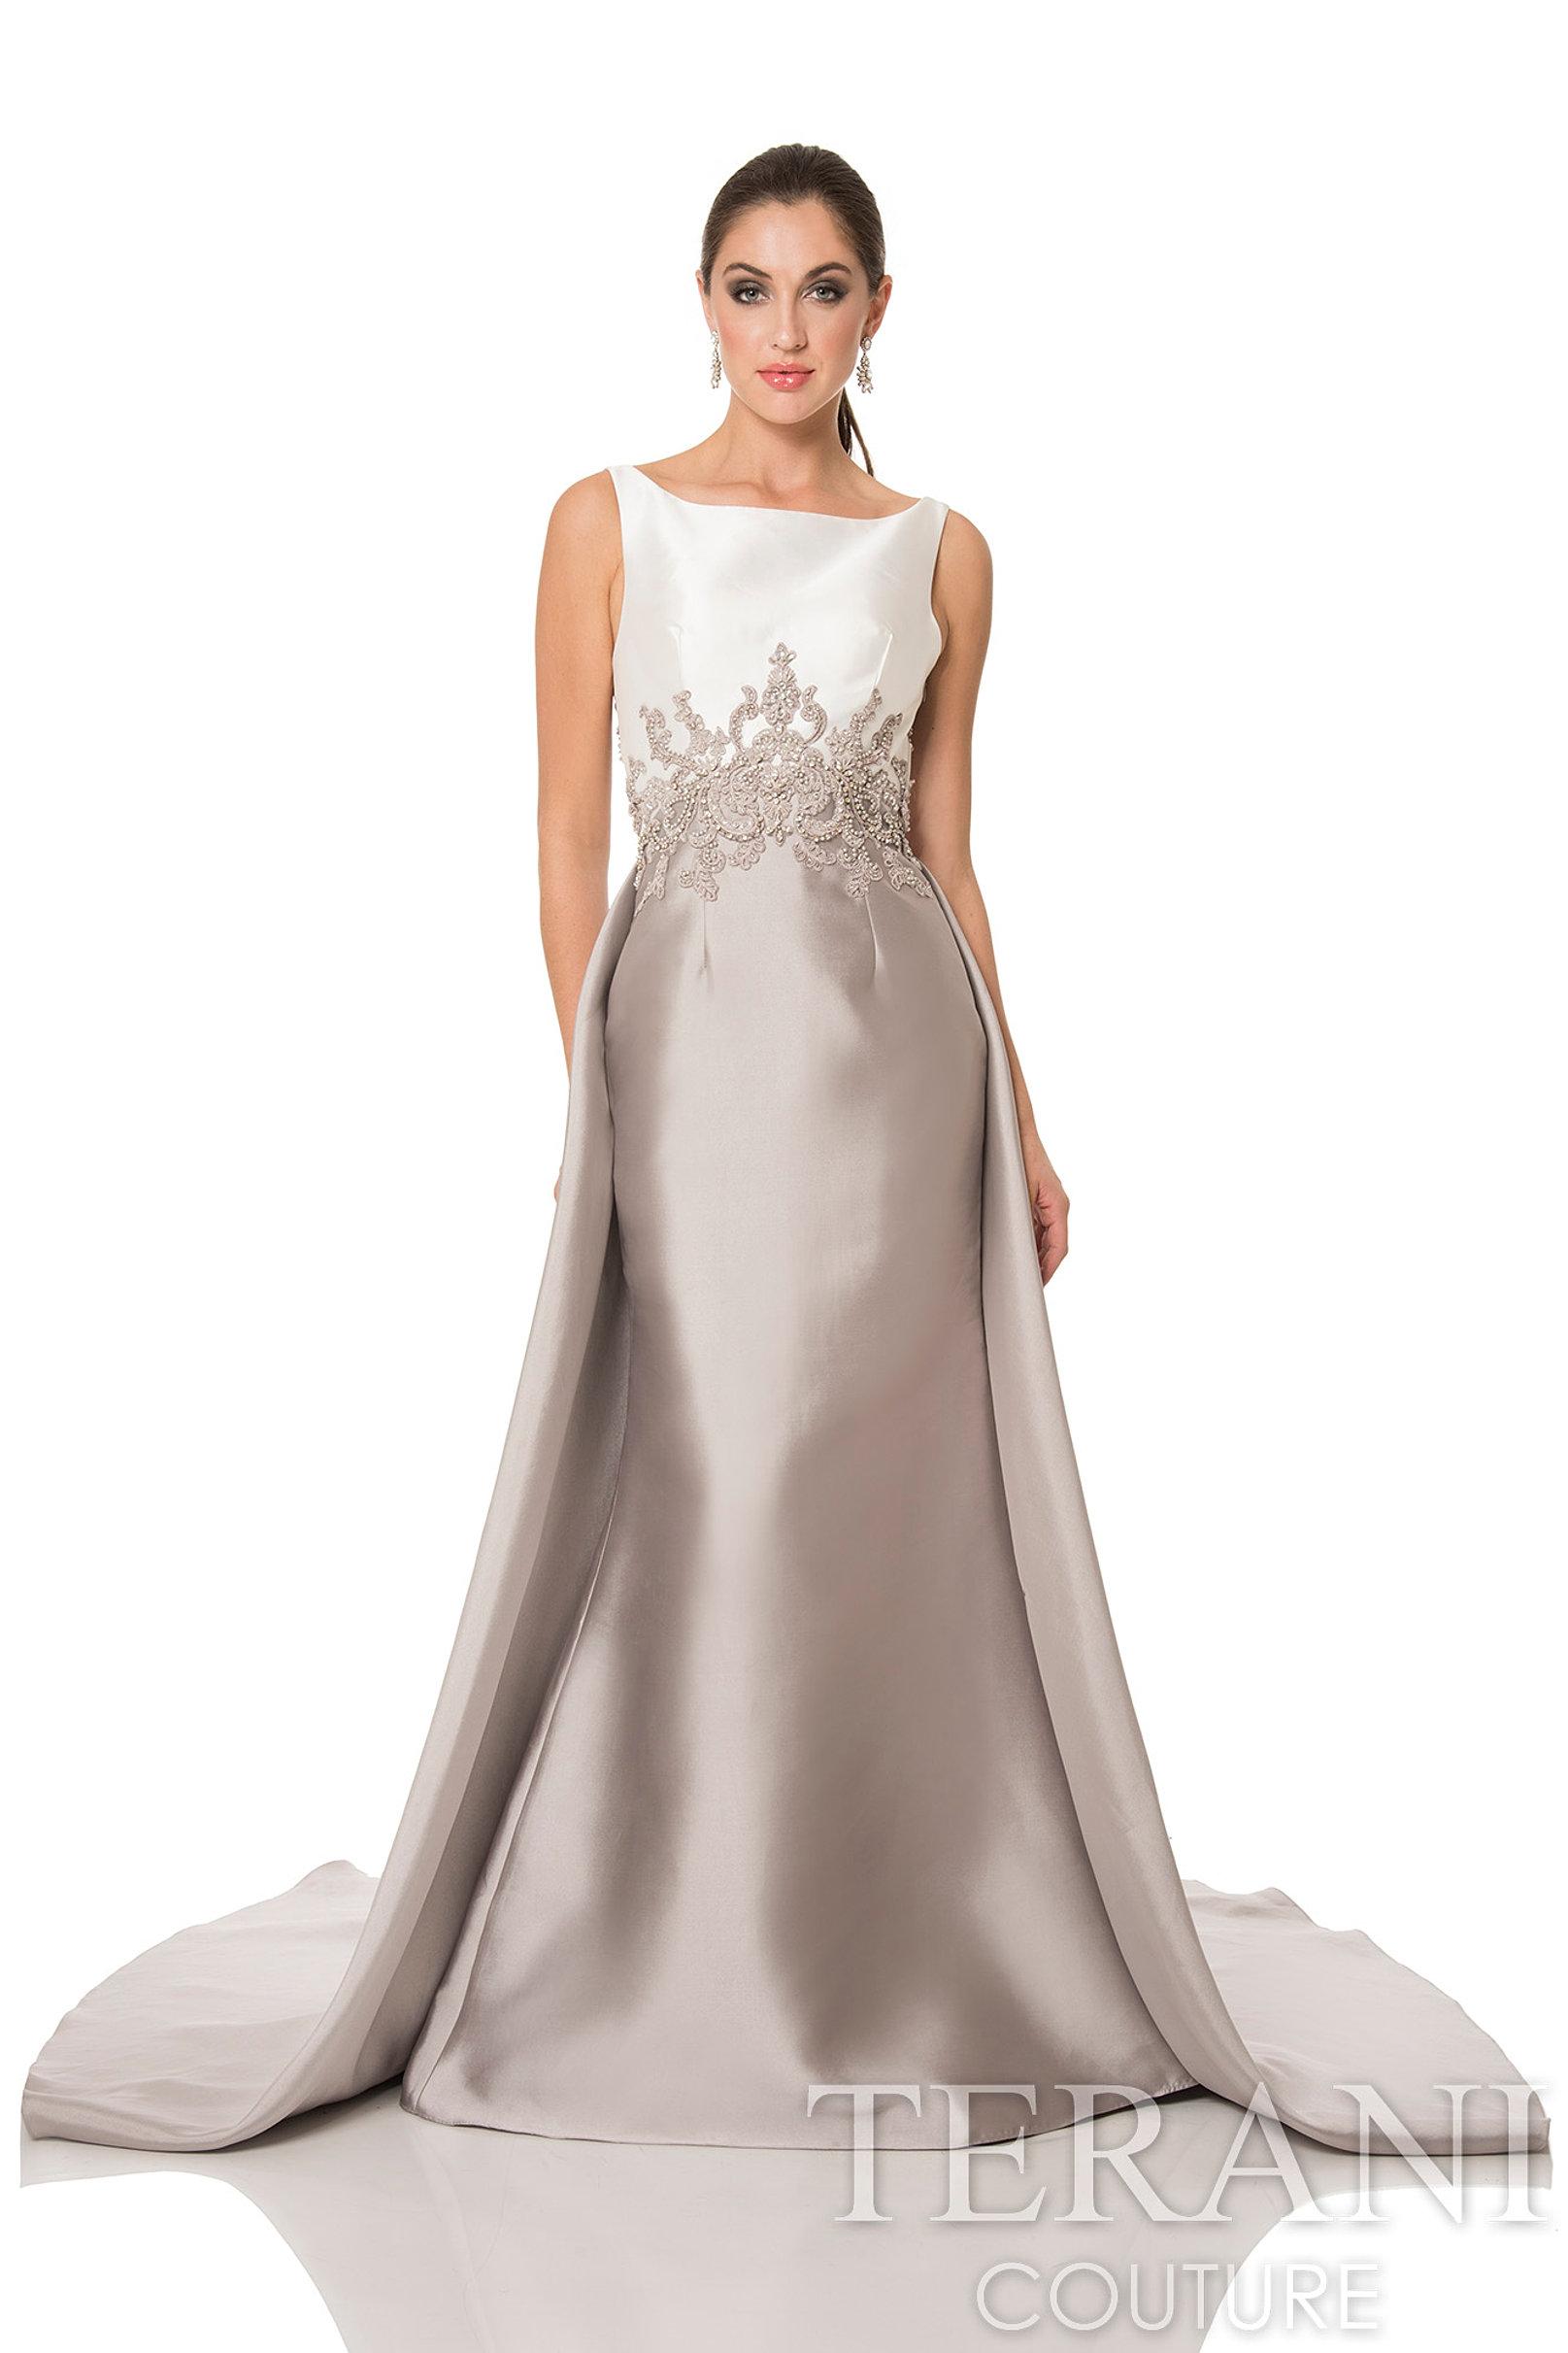 Boca Raton Bridal- Mother of the Bride